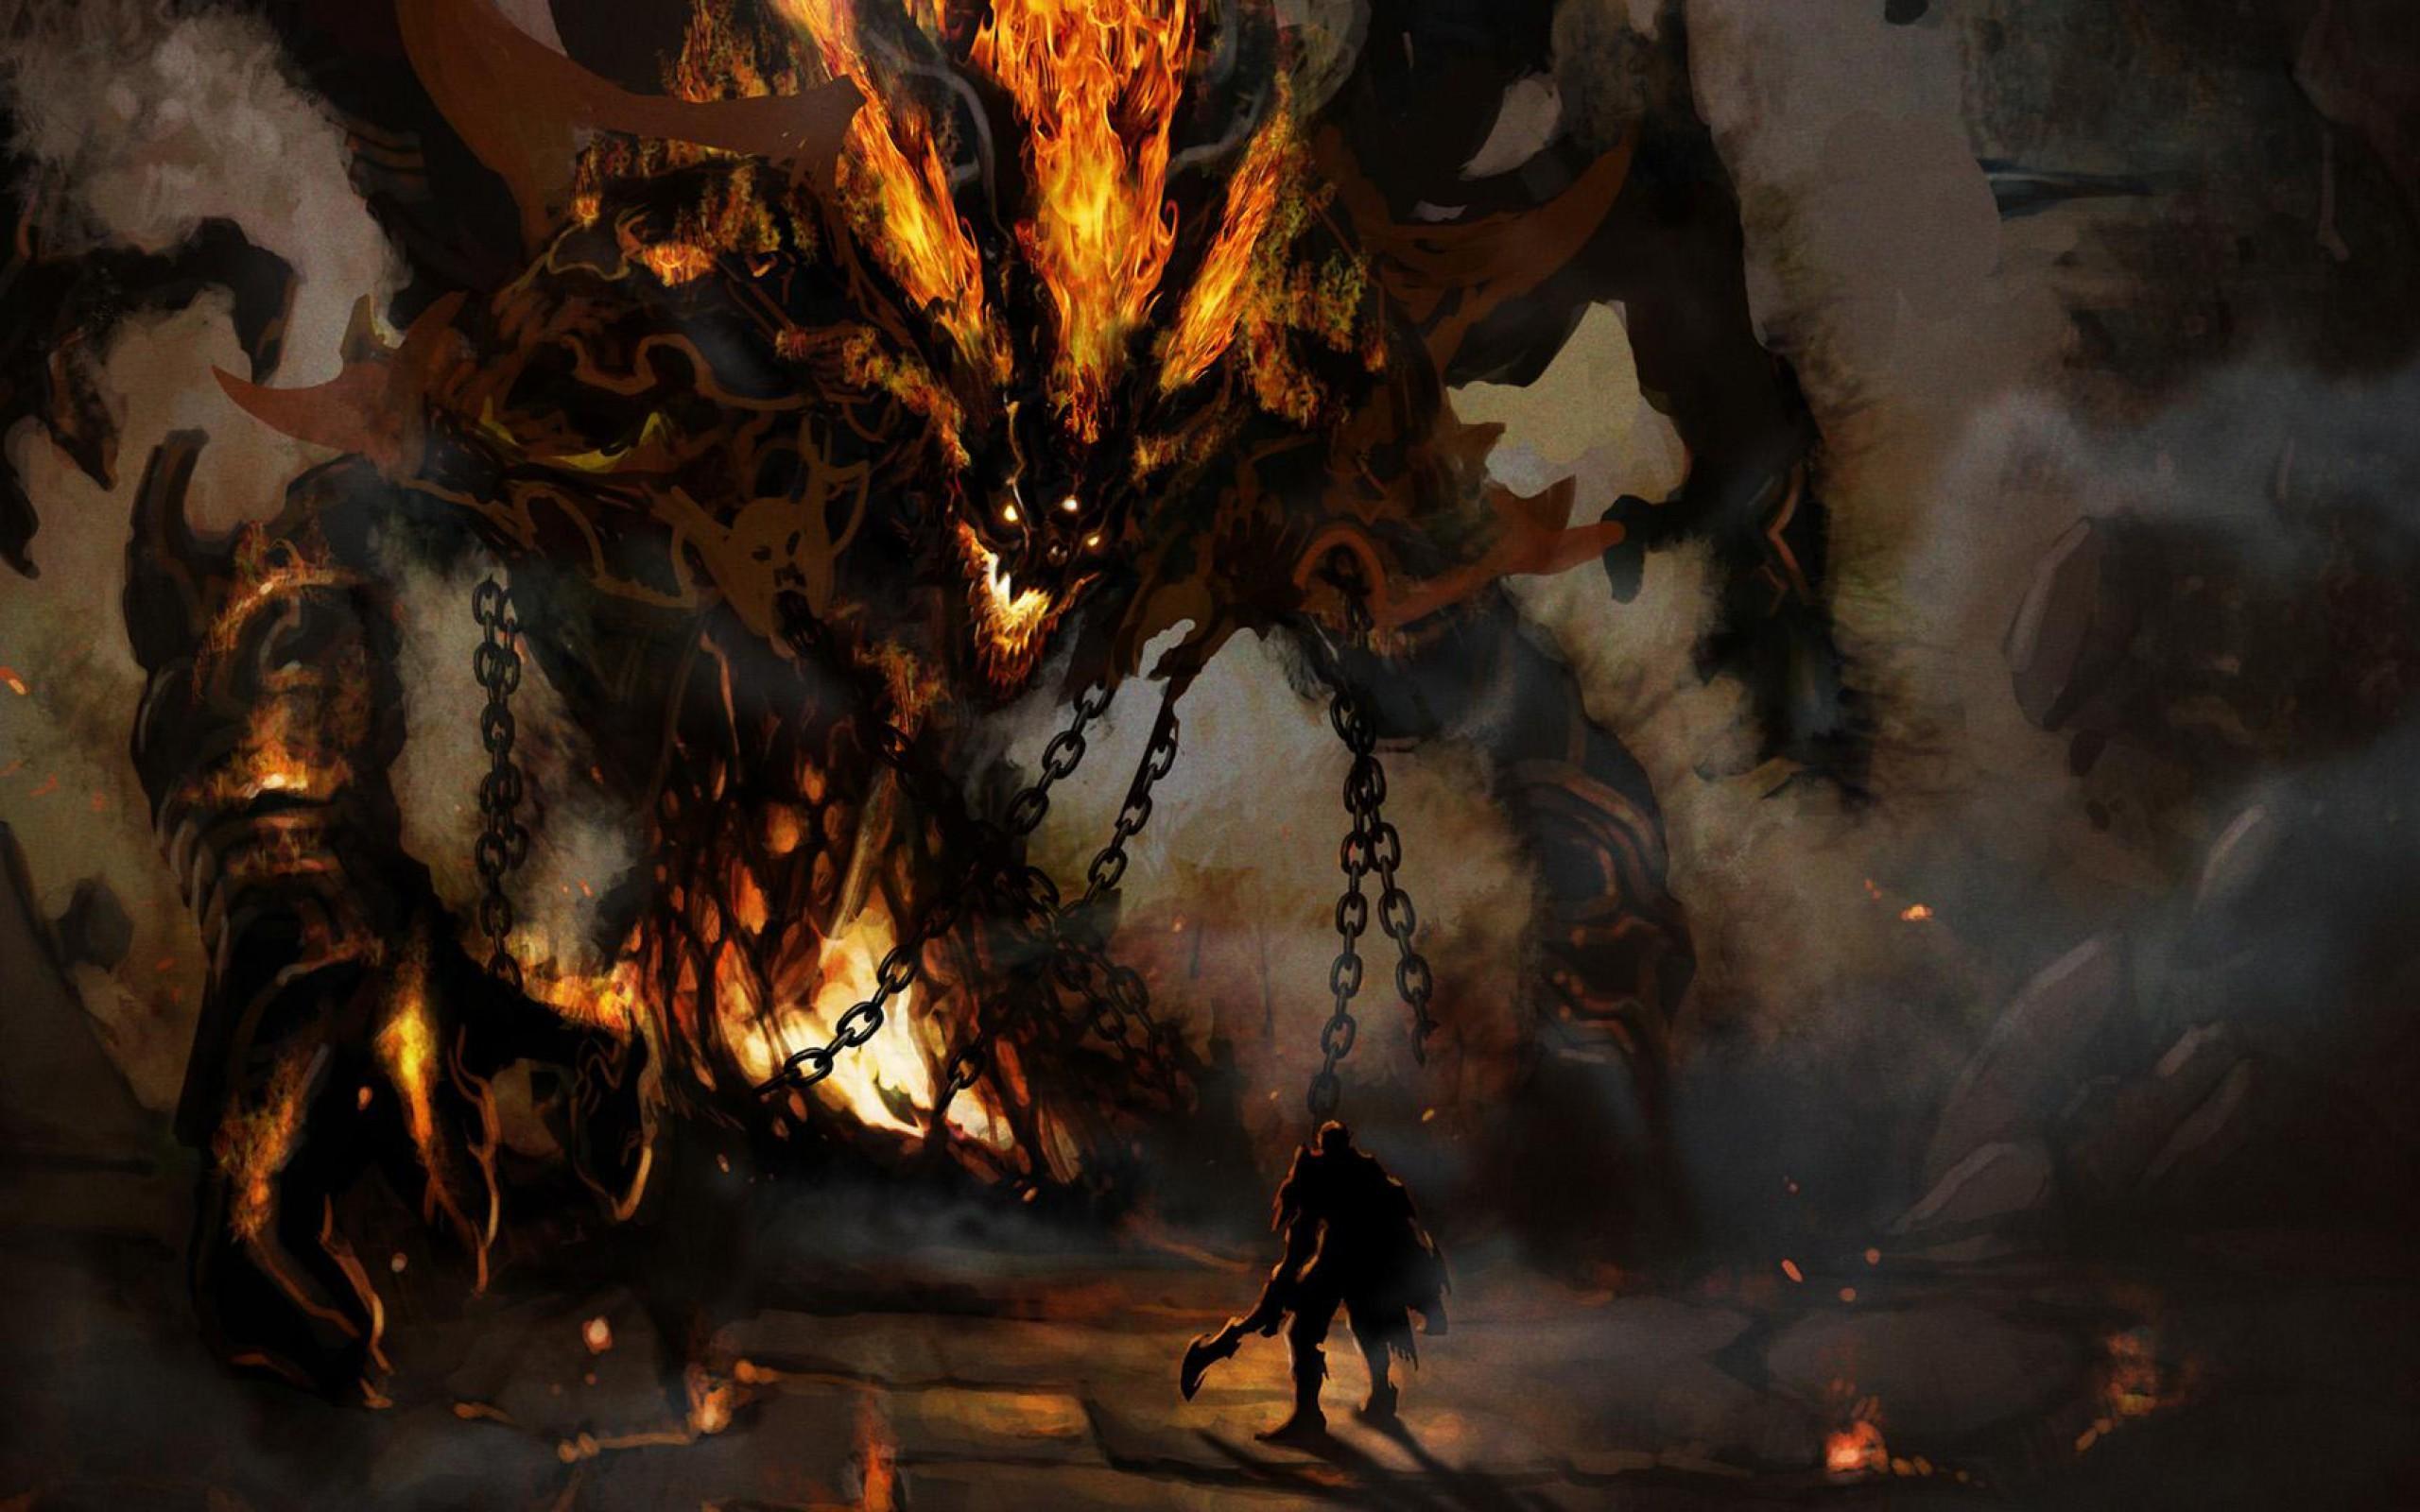 Res: 2560x1600, Demon Wallpaper